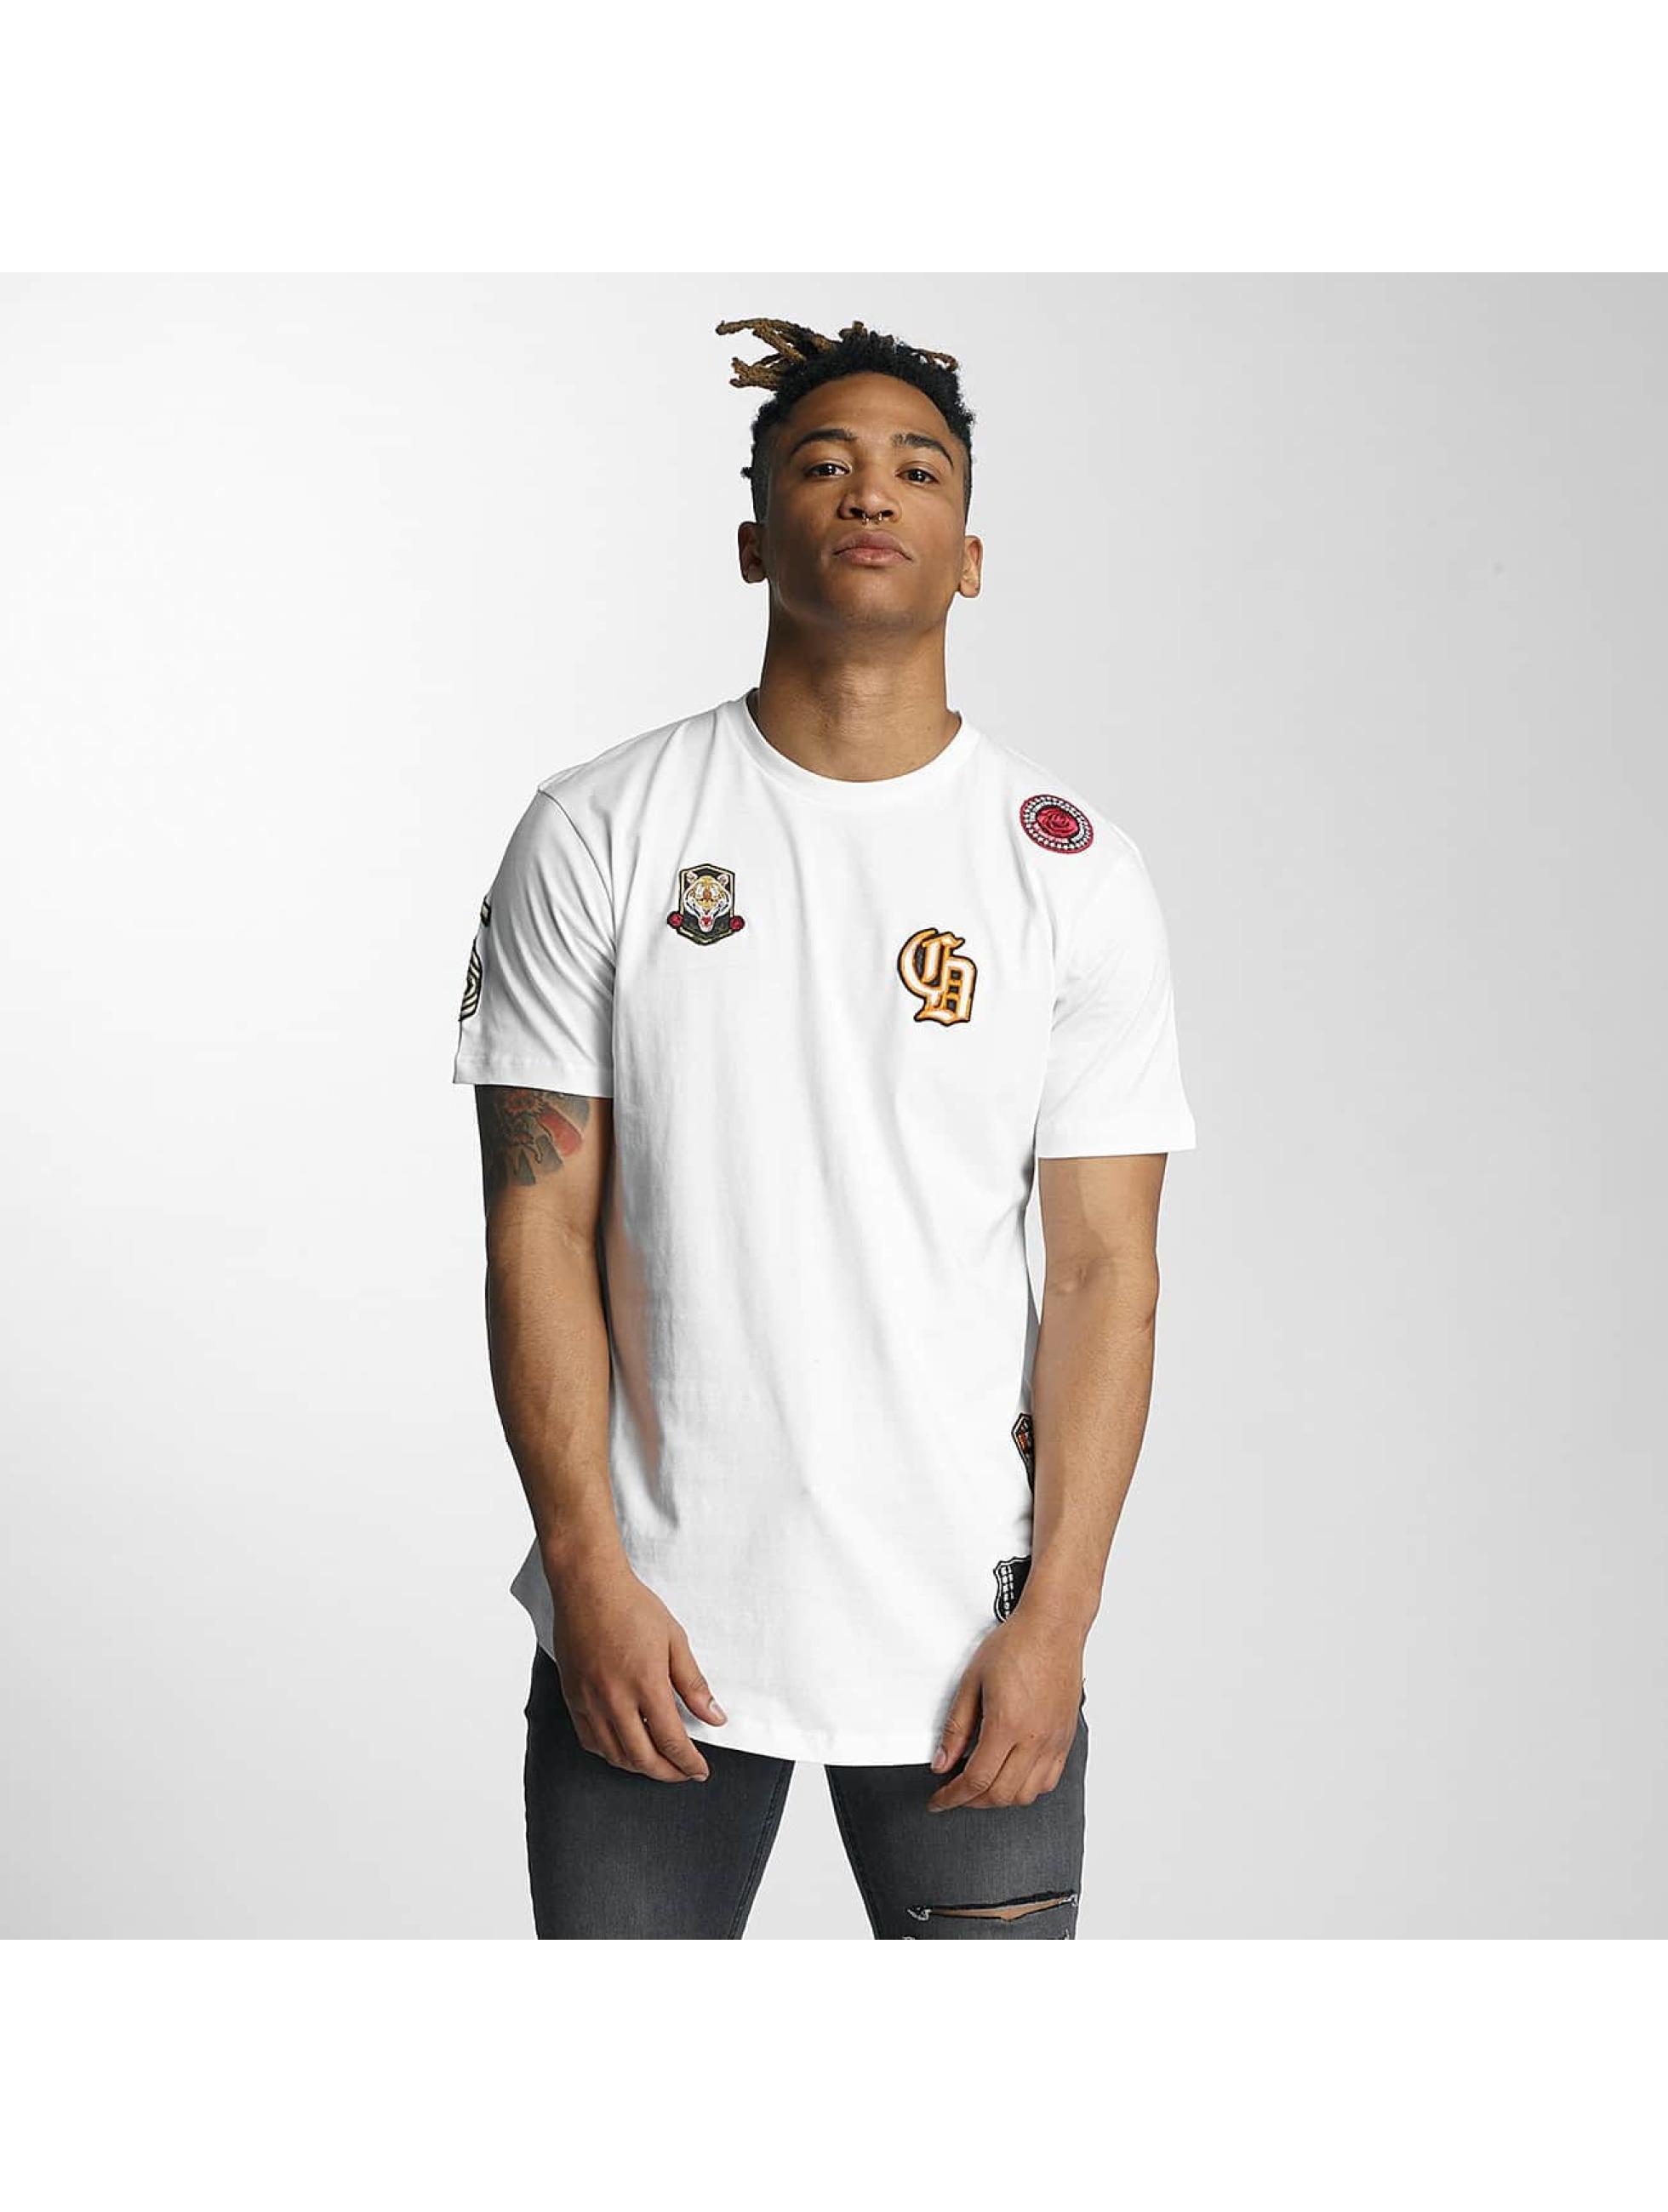 T-Shirt Emblem in weiß